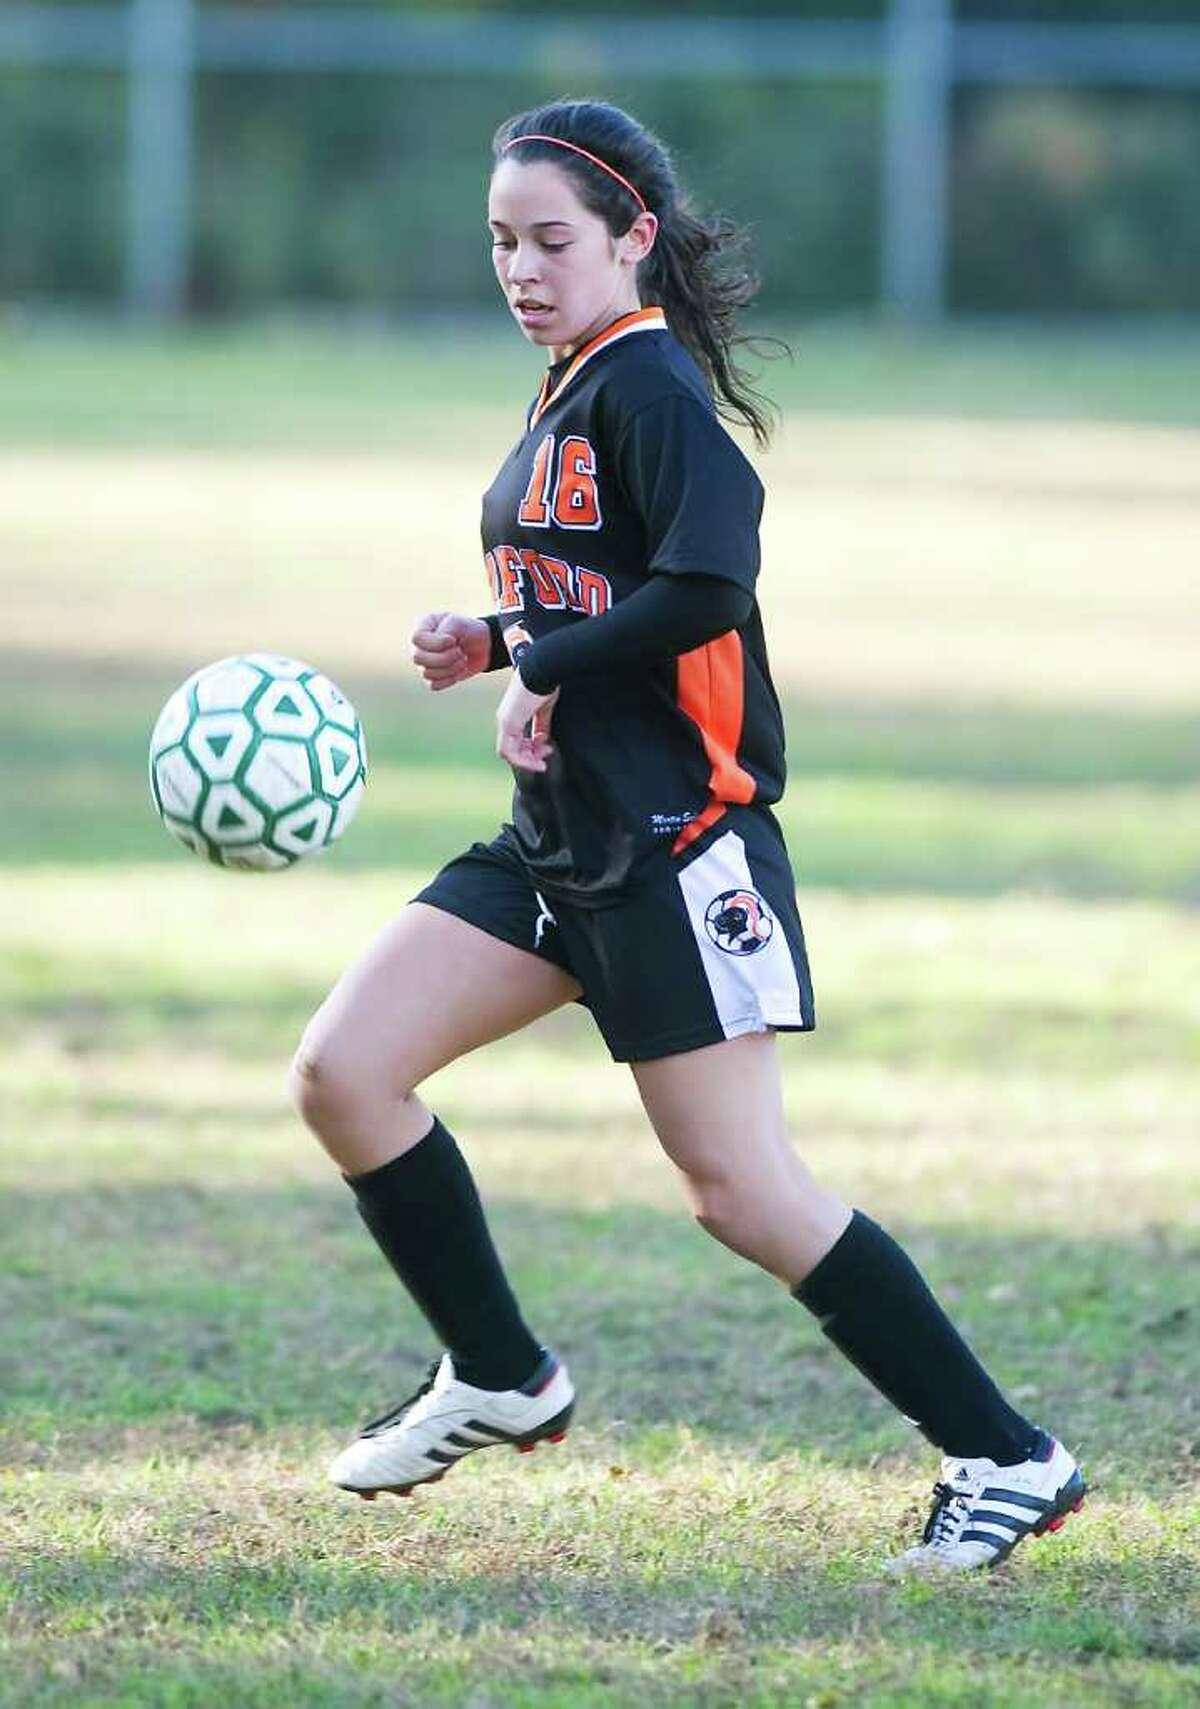 Stamford High School's Sam Lyman controls the ball against Trinity Catholic High School in girls soccer at Trinity in Stamford, Conn. on Friday October 22, 2010.